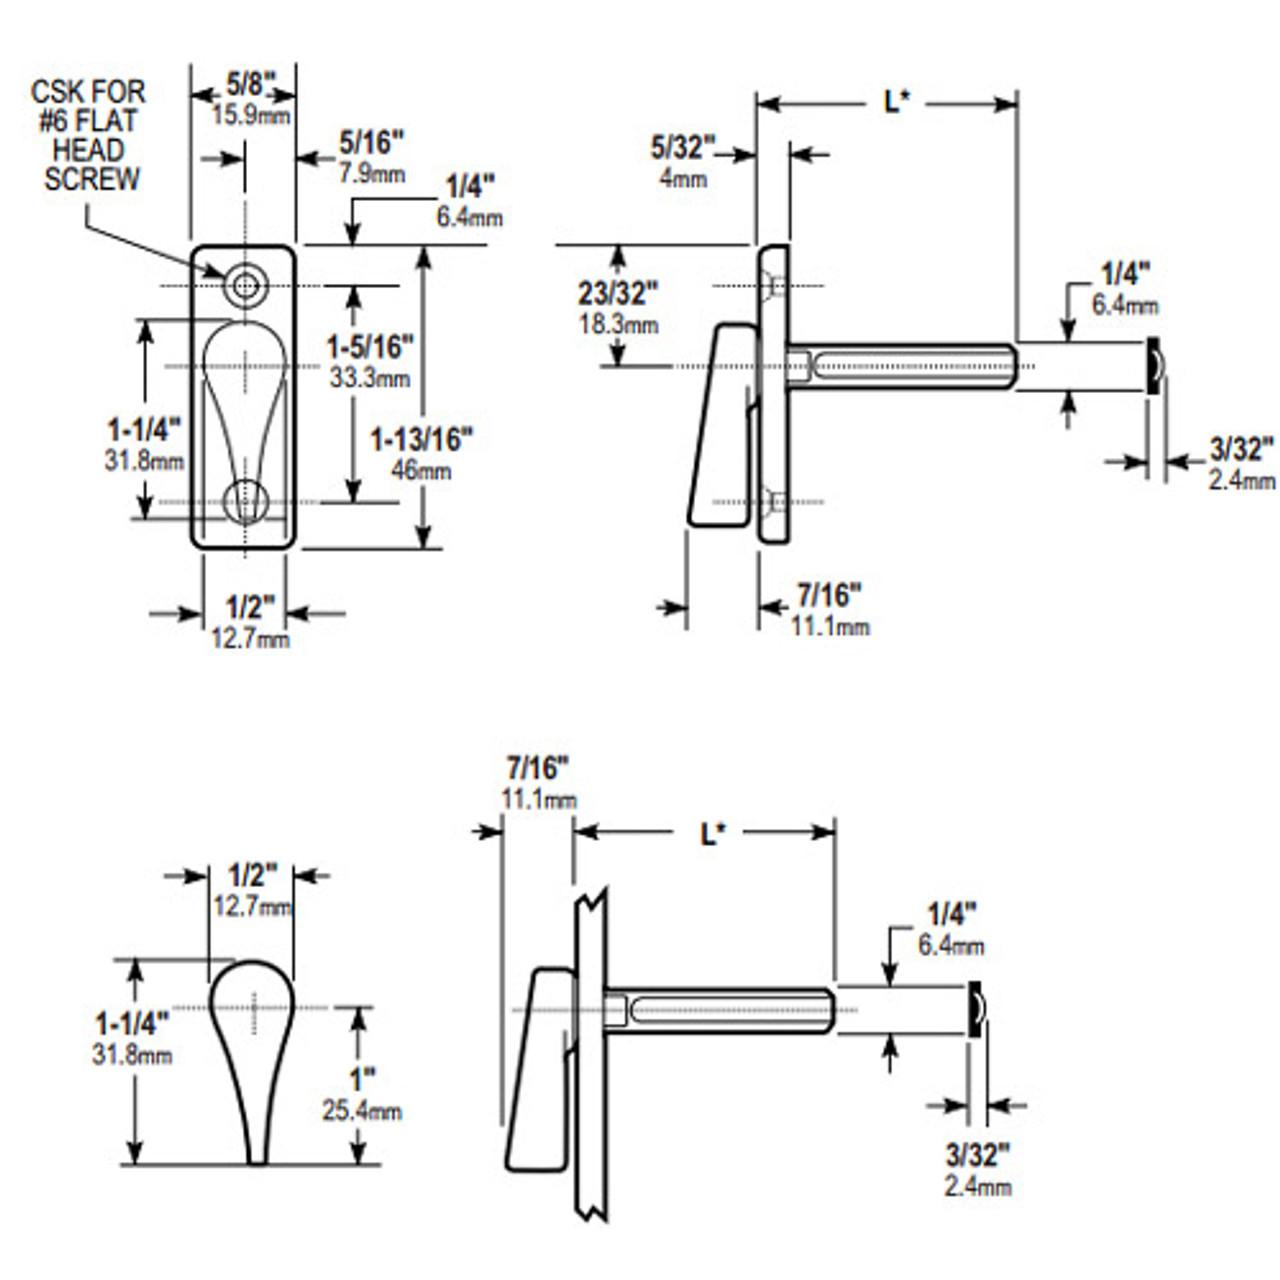 1000-21-19-130 Adams Rite 1000 Series Turns Dimensional View